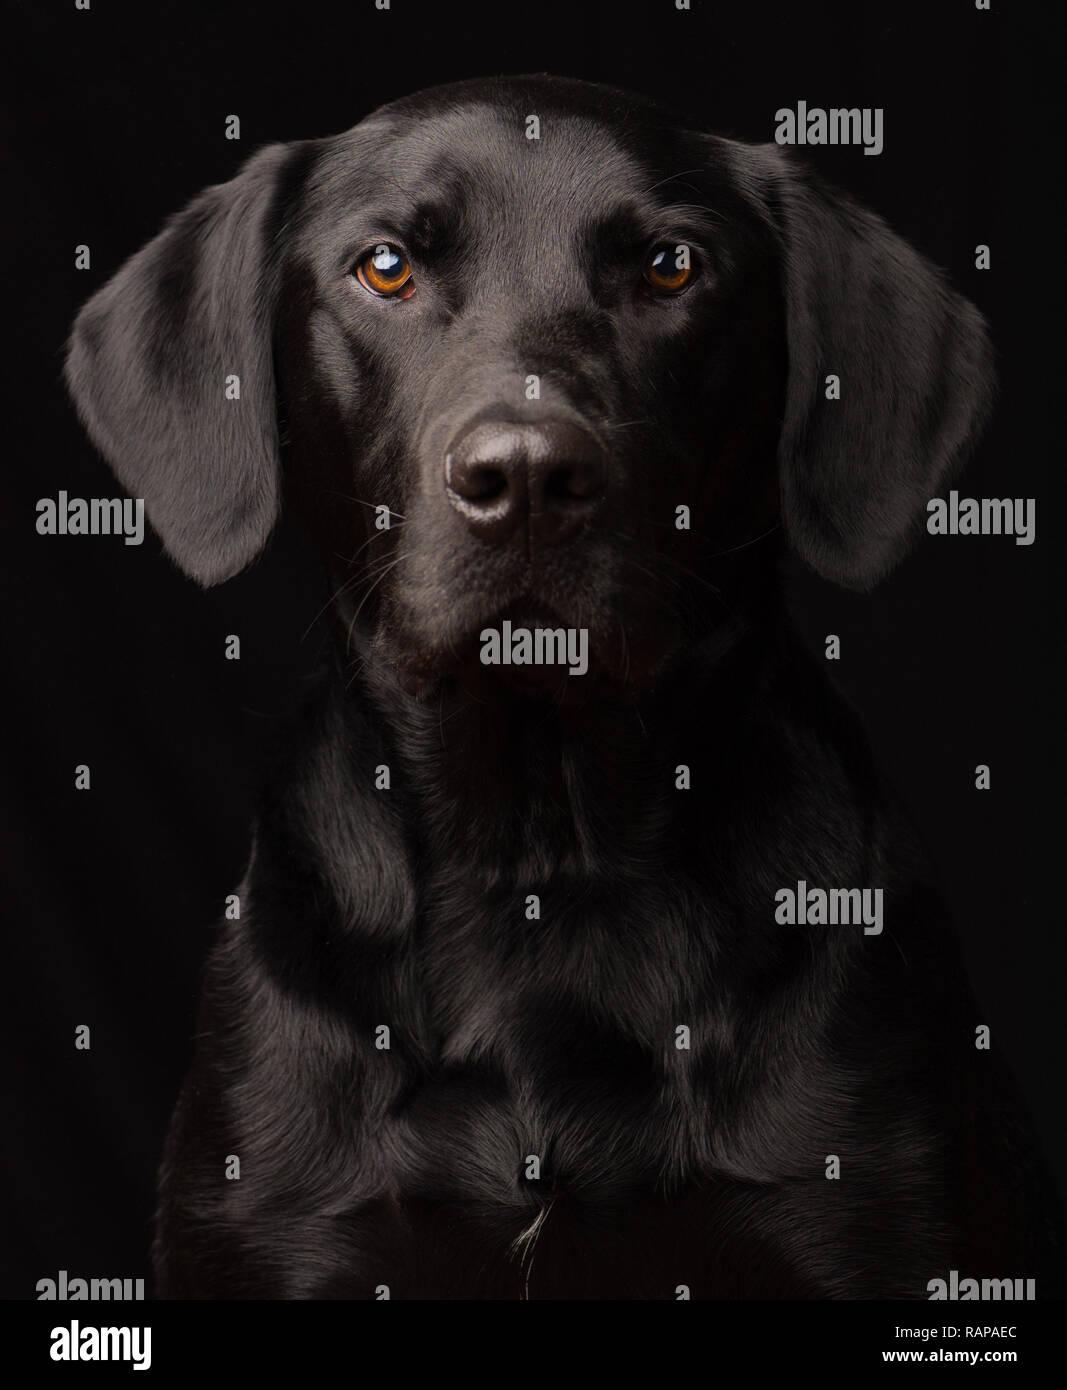 Black Labrador Dog portrait taken in a studio setting against a black background - Stock Image